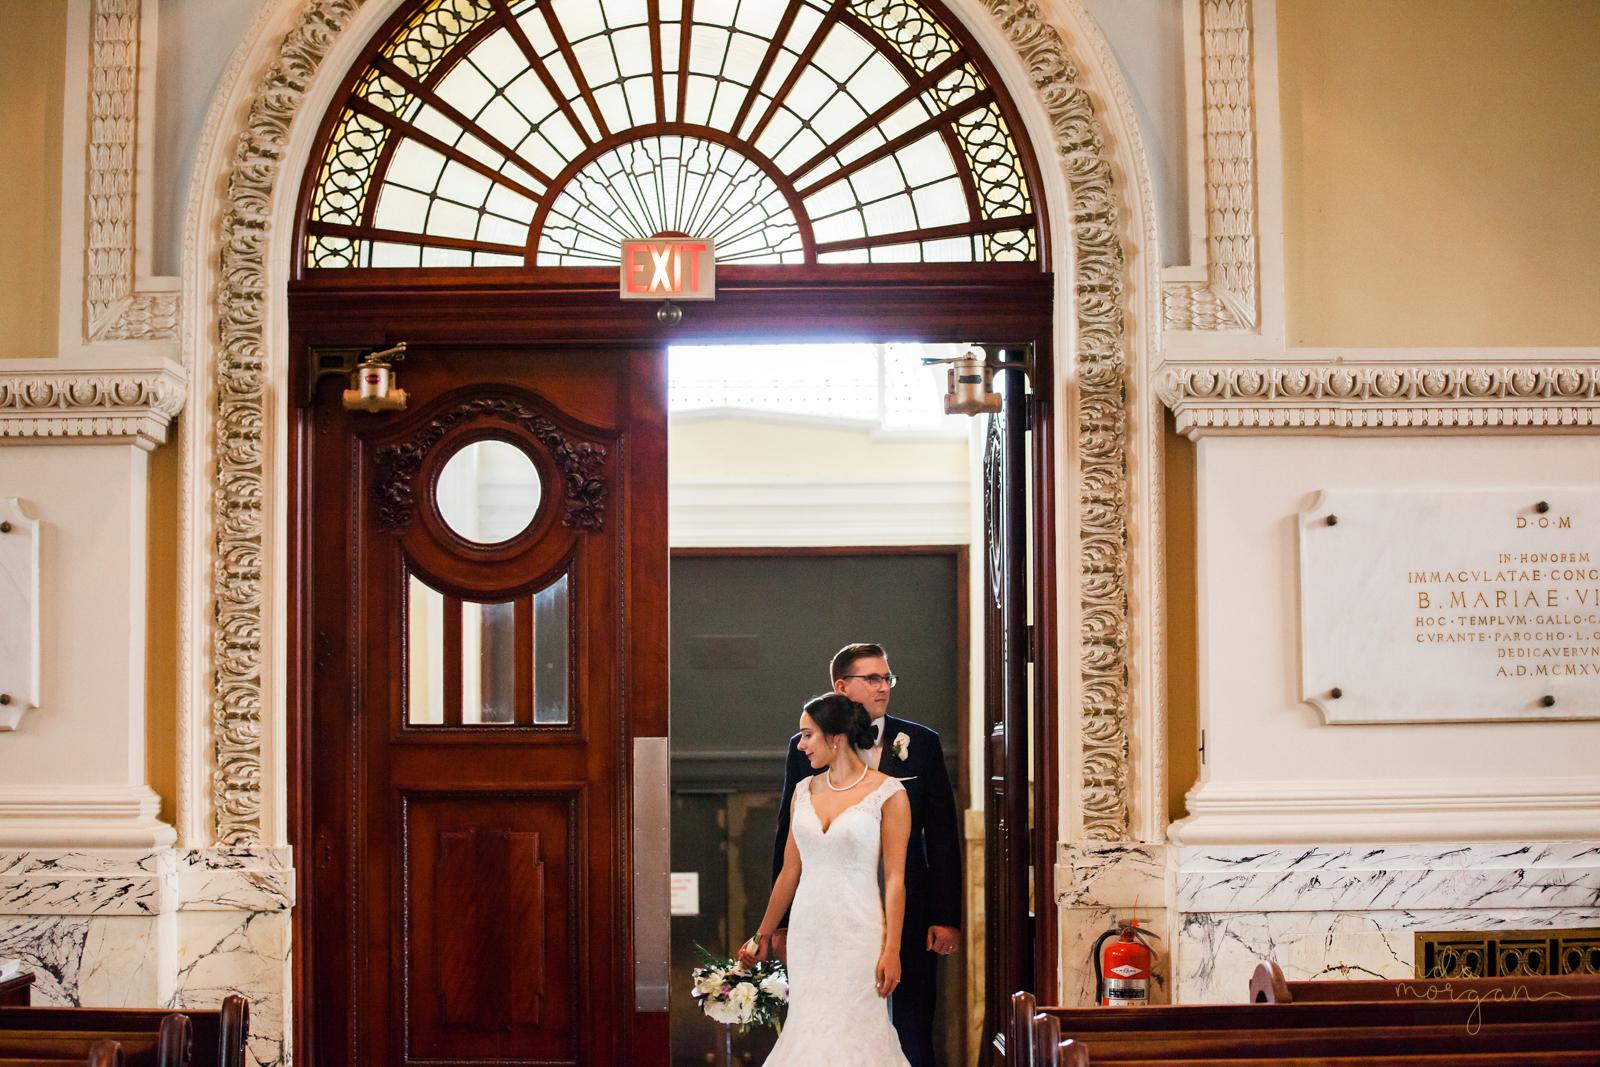 Notre-Dame-Catholic-Church-Wedding-Amanda-Morgan-17.jpg